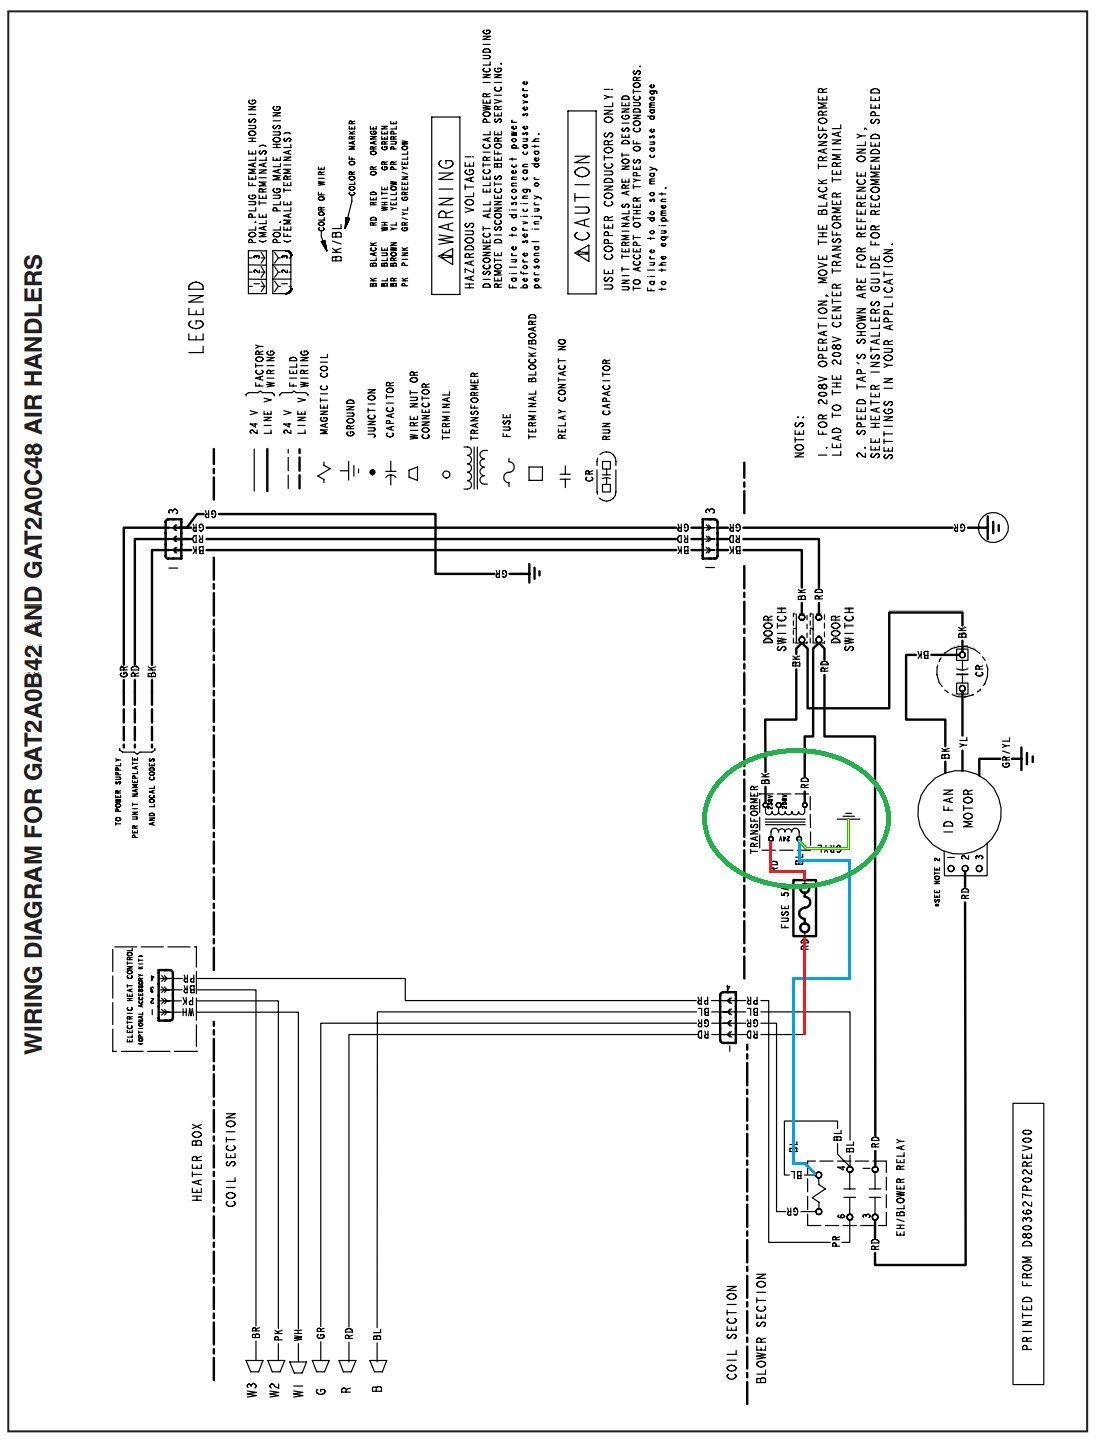 Diagram Wiring Model Trane Diagram Wphd0197 Full Version Hd Quality Diagram Wphd0197 Mediagrame Arte Viaggi It